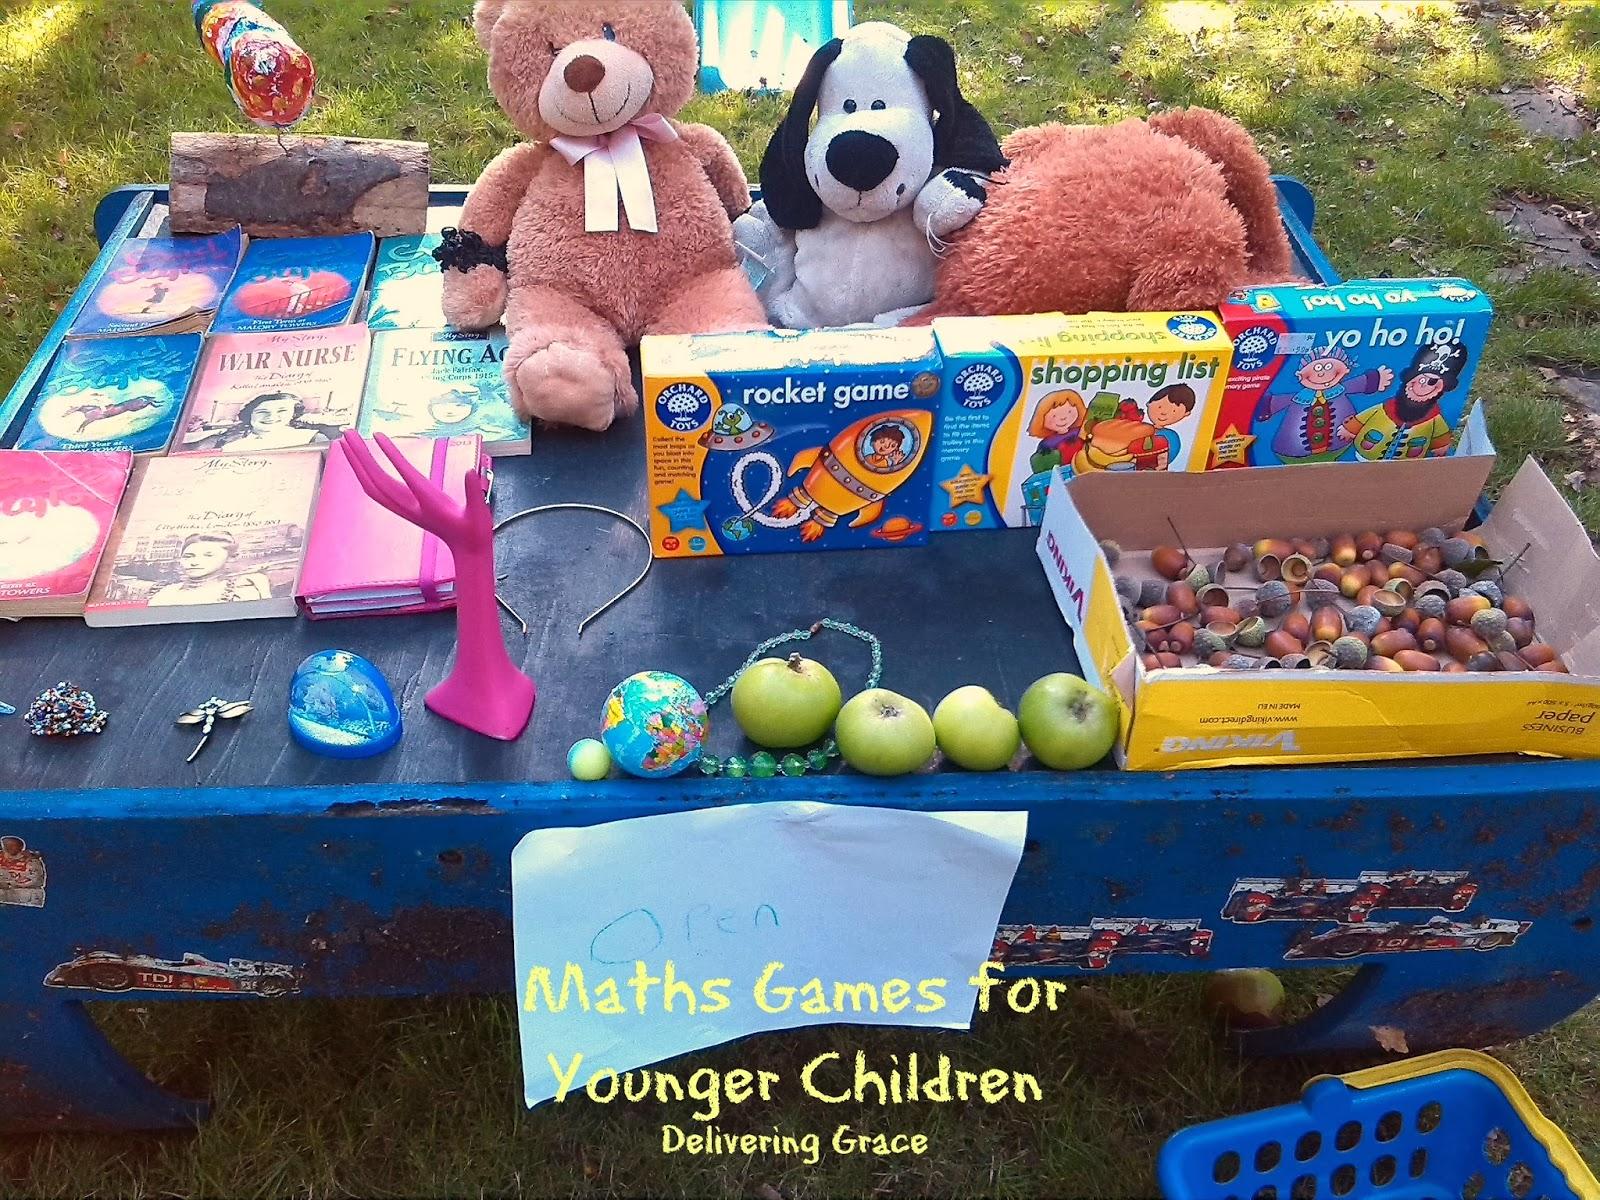 delivering grace: Maths Games for Younger Children